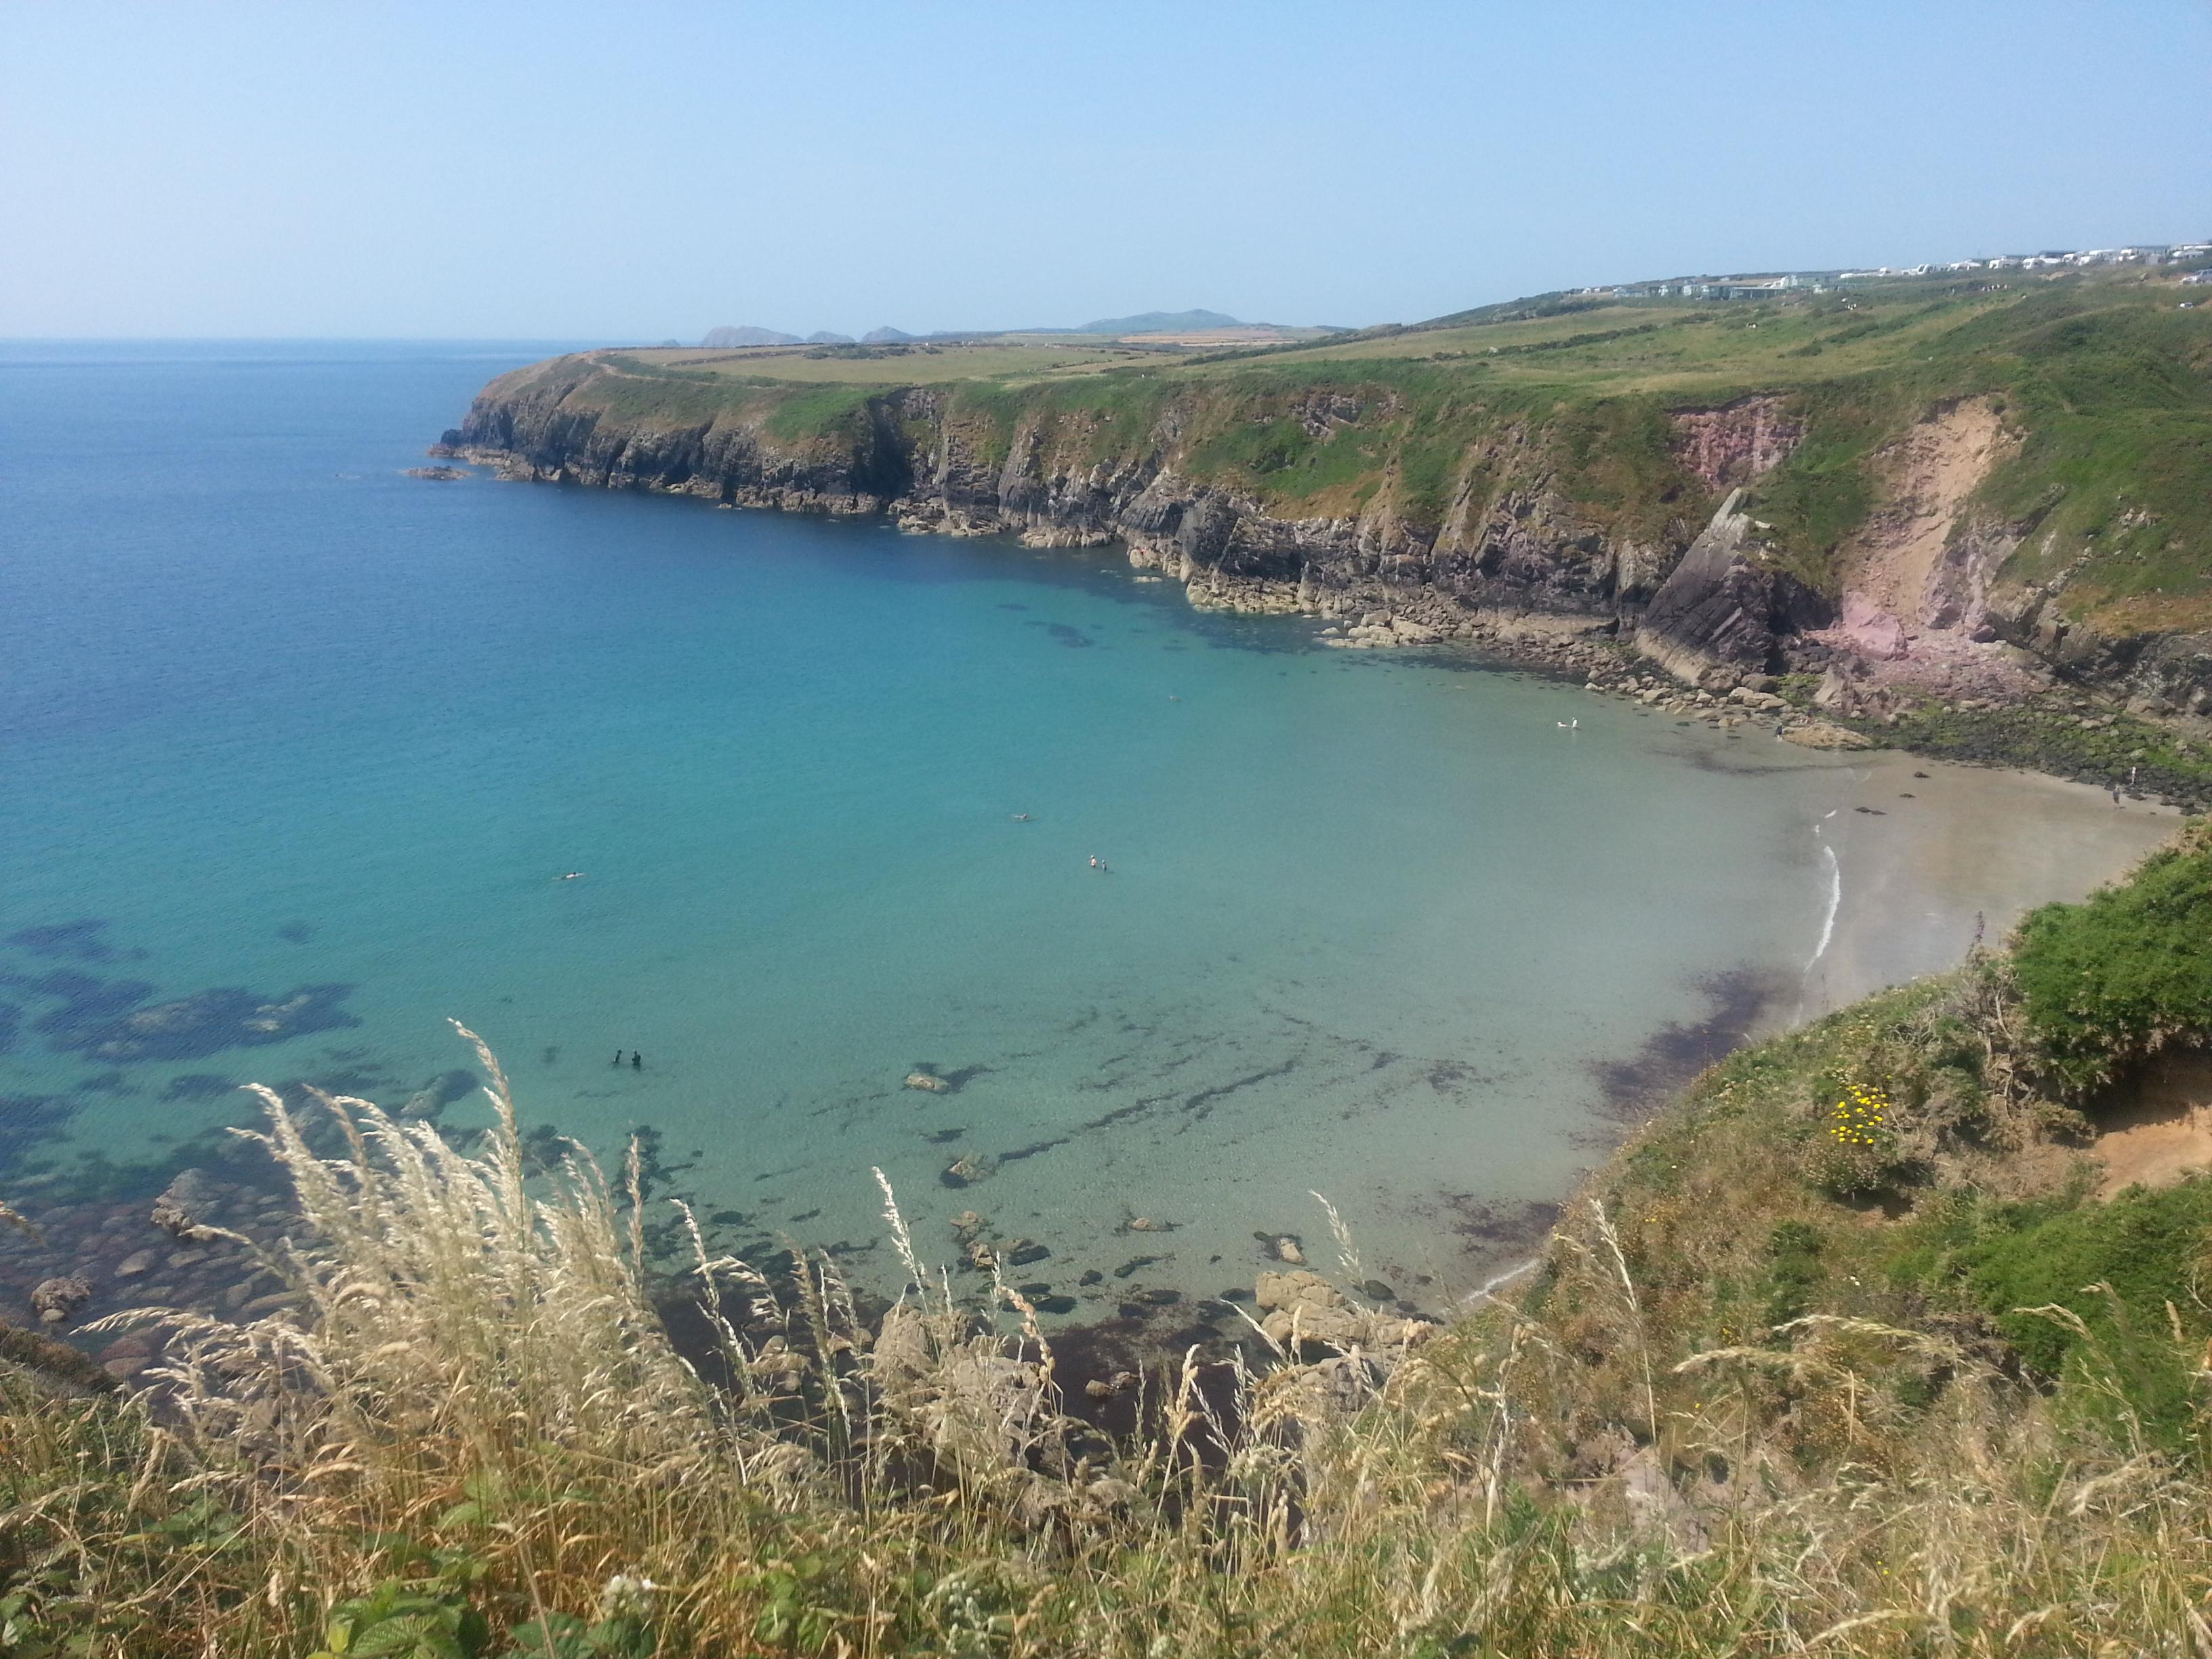 Caerfai Bay and the Park